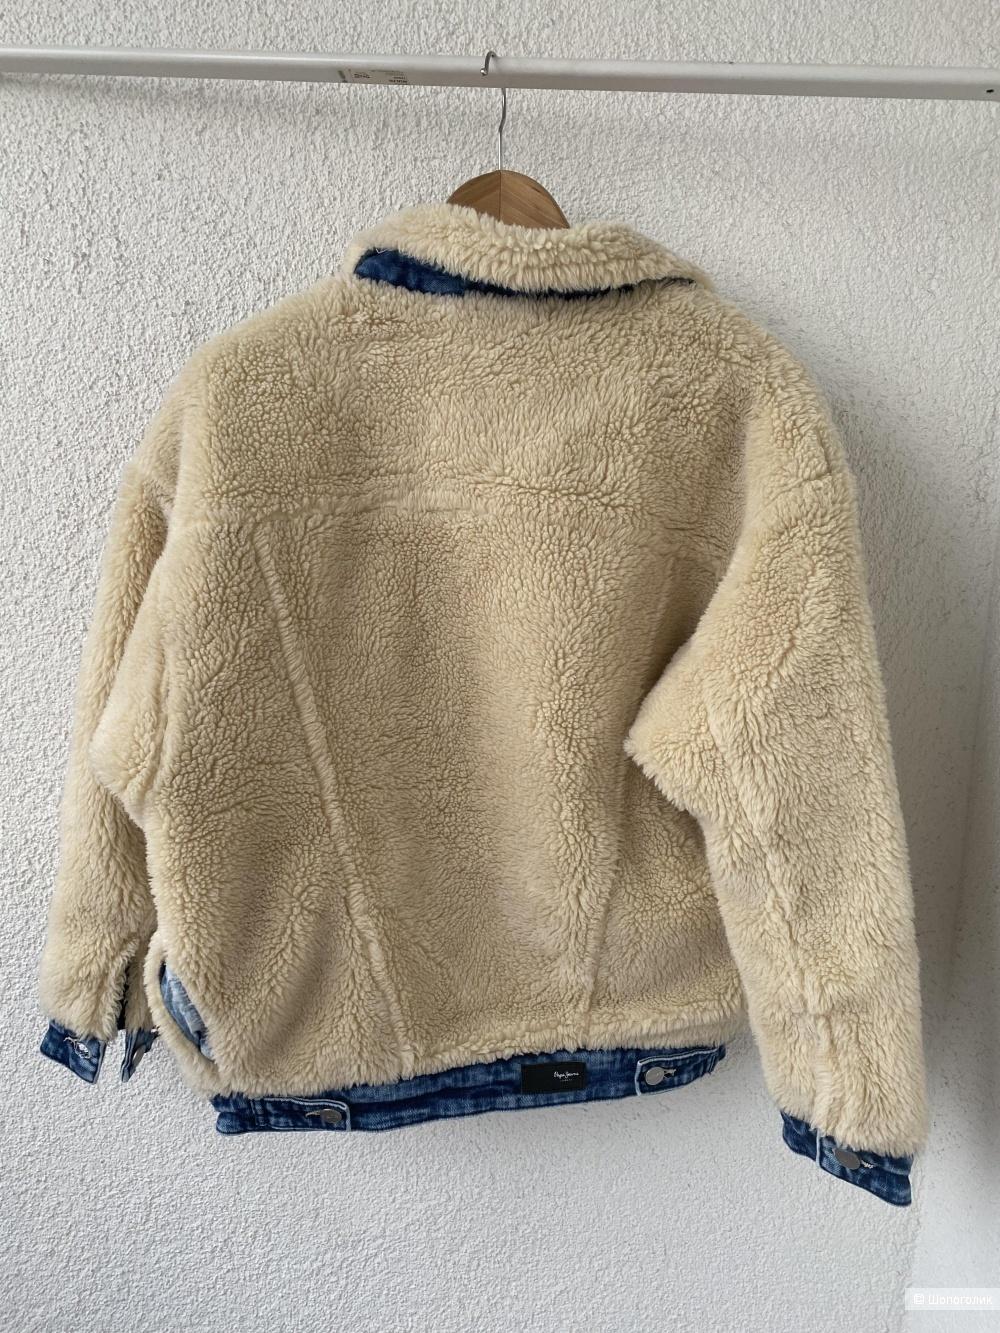 Шерстяной Бомбер Pepe Jeans, pp Xs-S